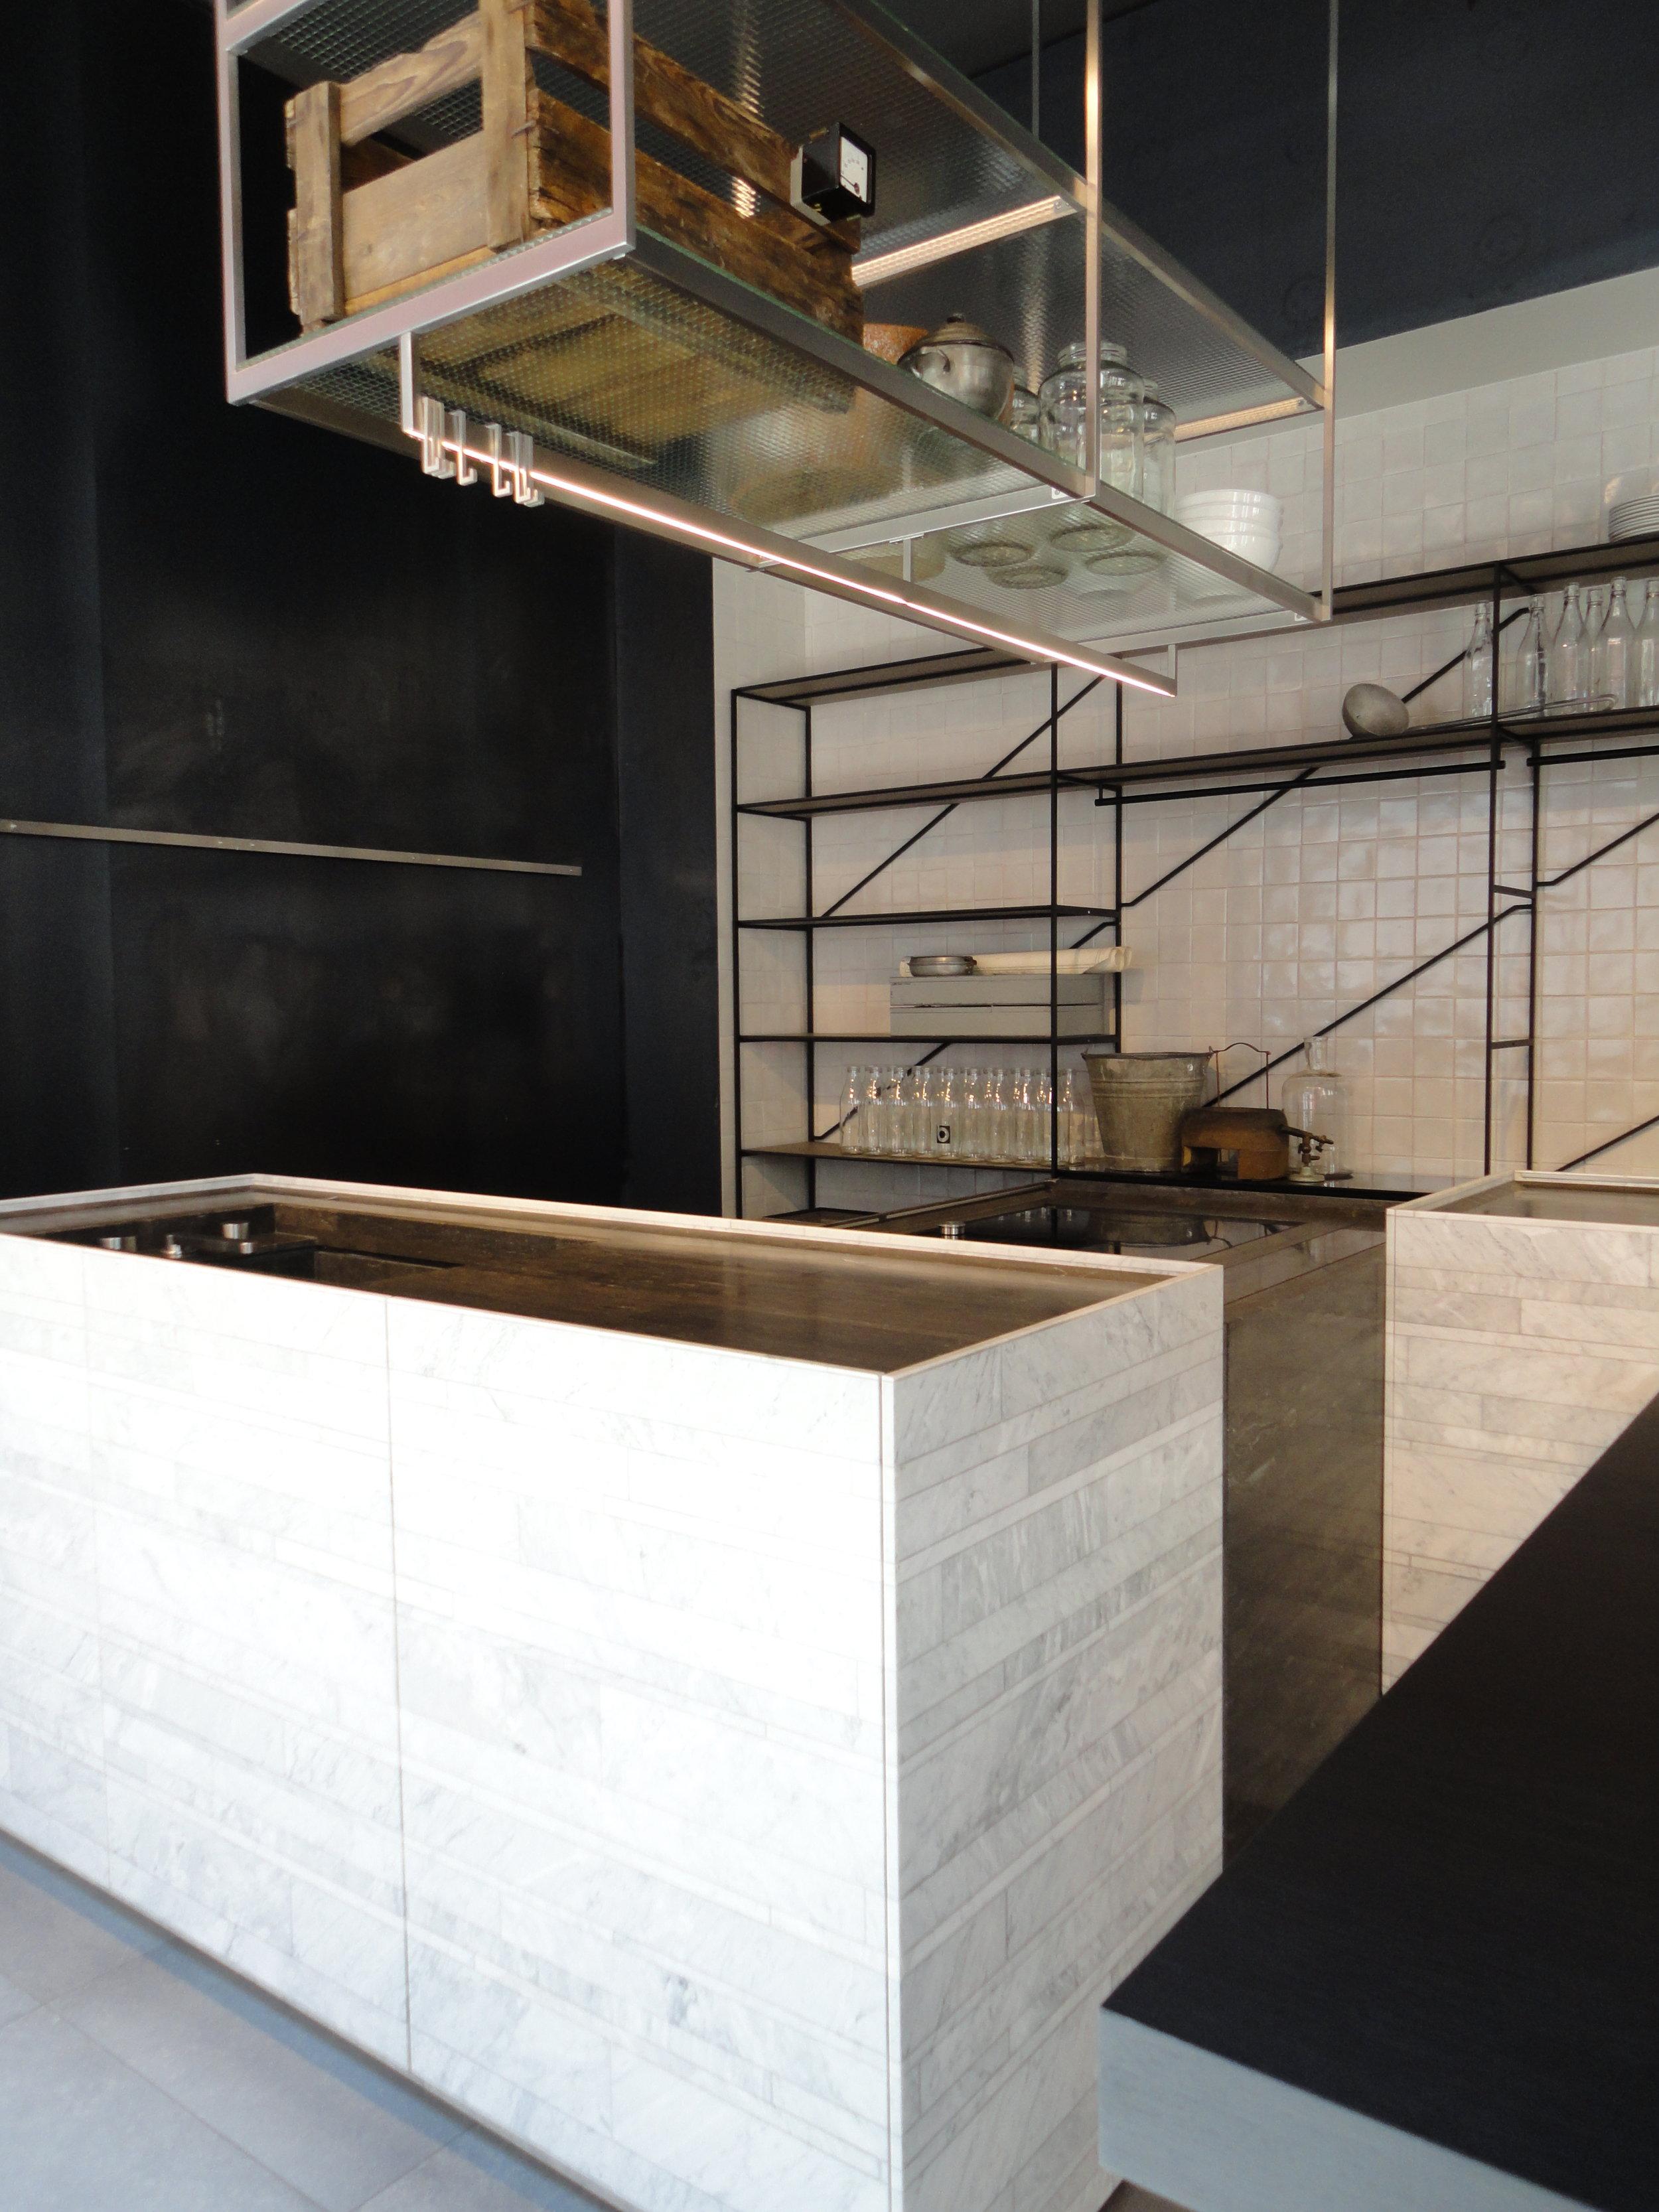 Piero Lissoni kitchen, featuring Salvatori marble clad doors